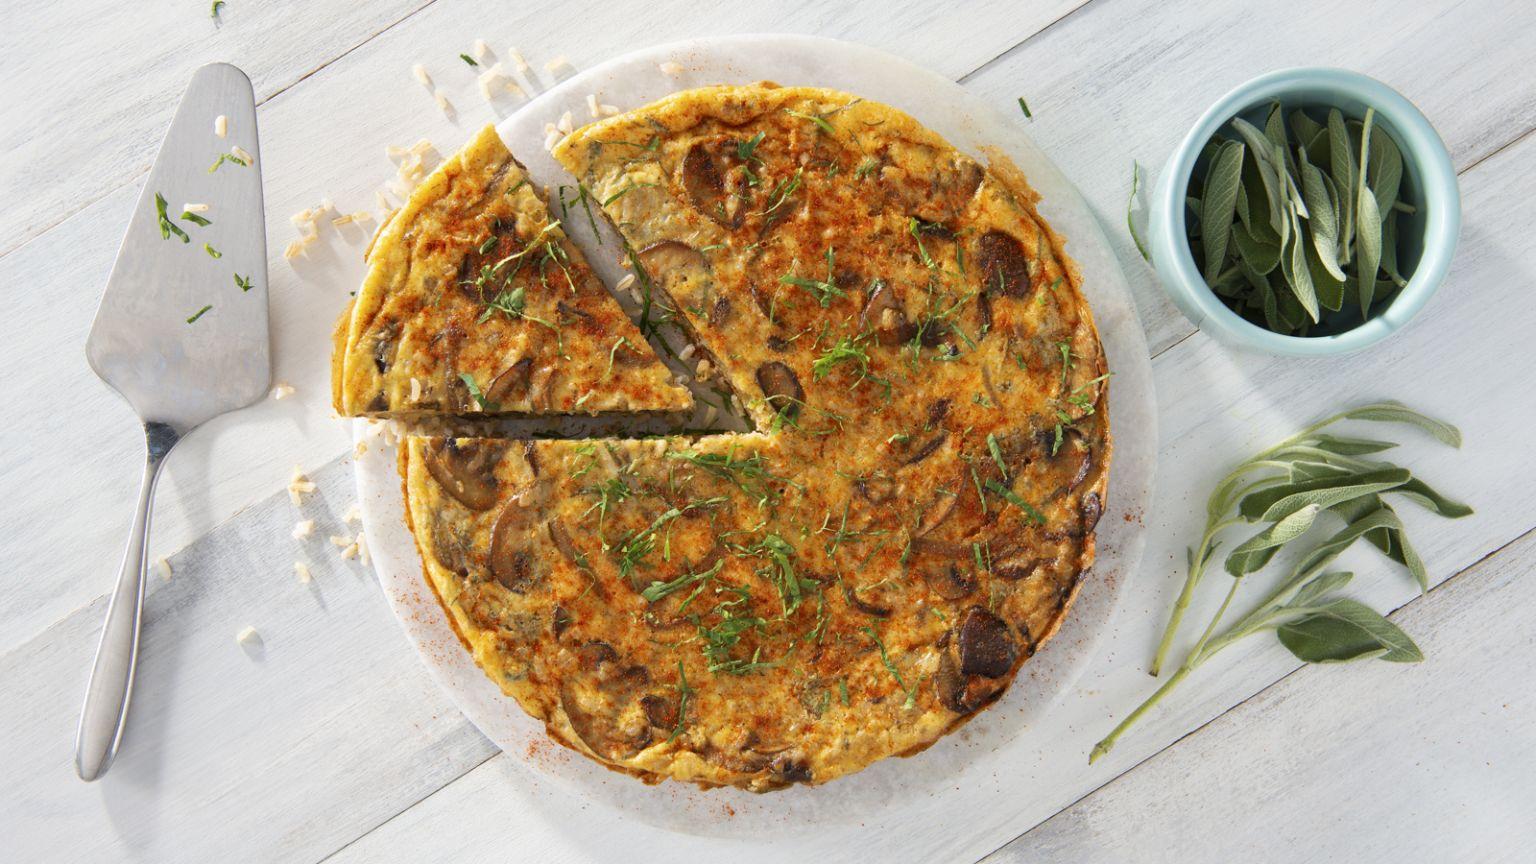 Tortilla Española with Brown Rice